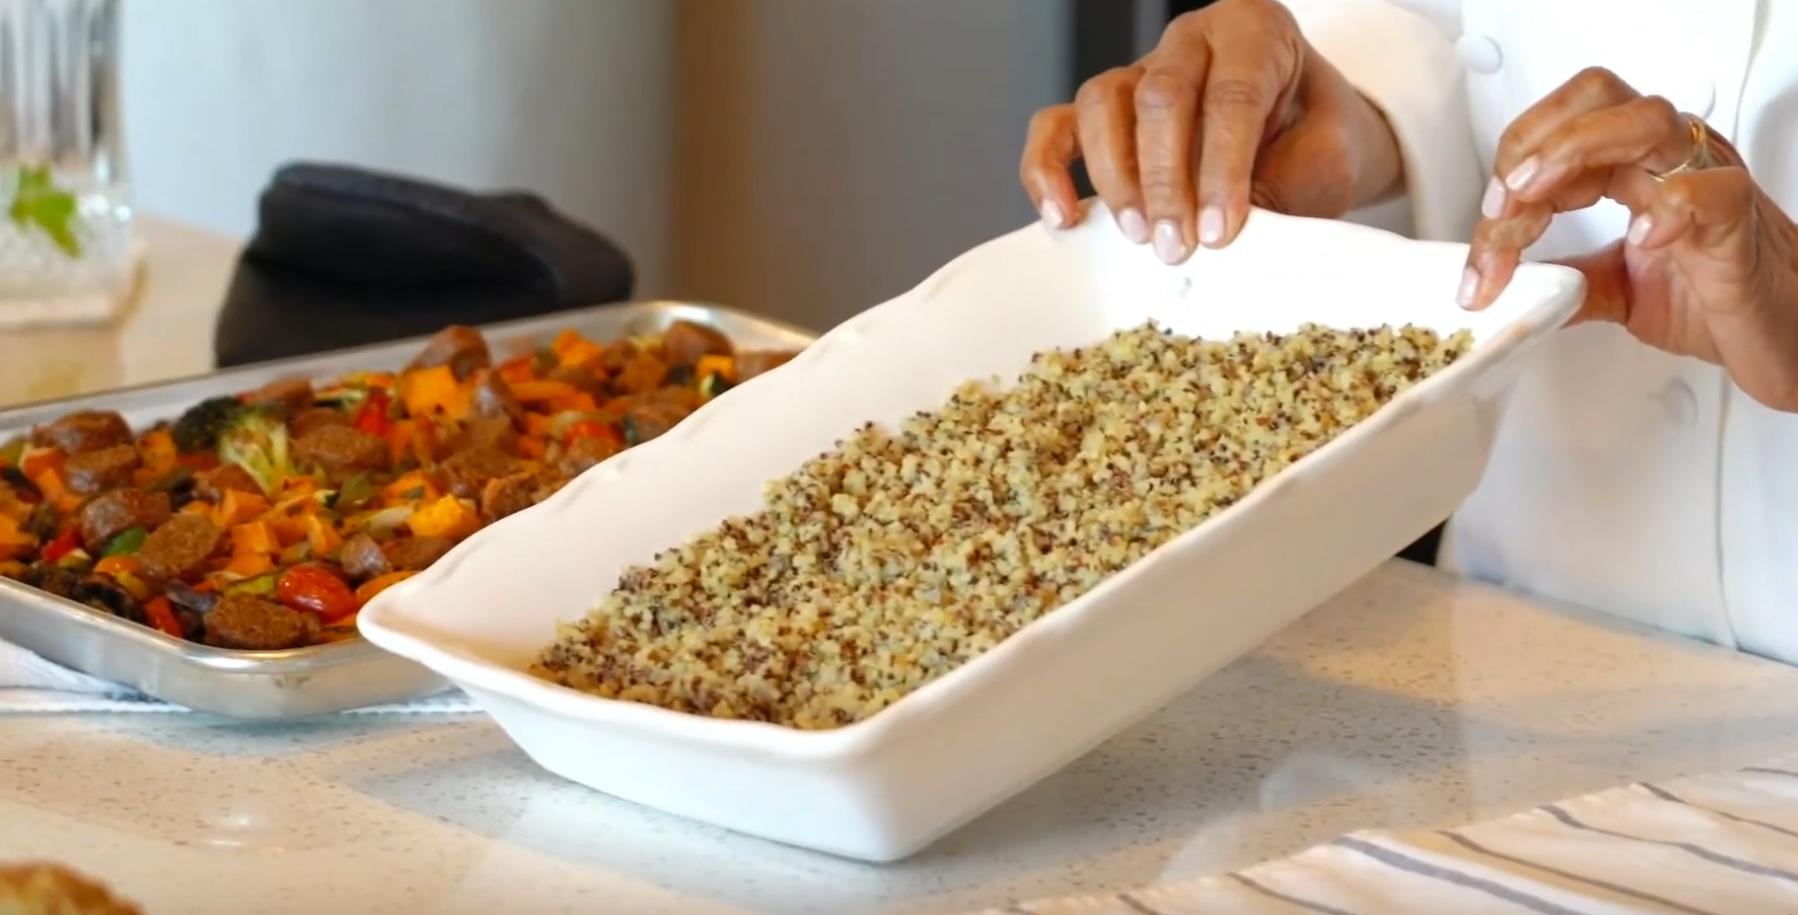 Oven Baked Quinoa